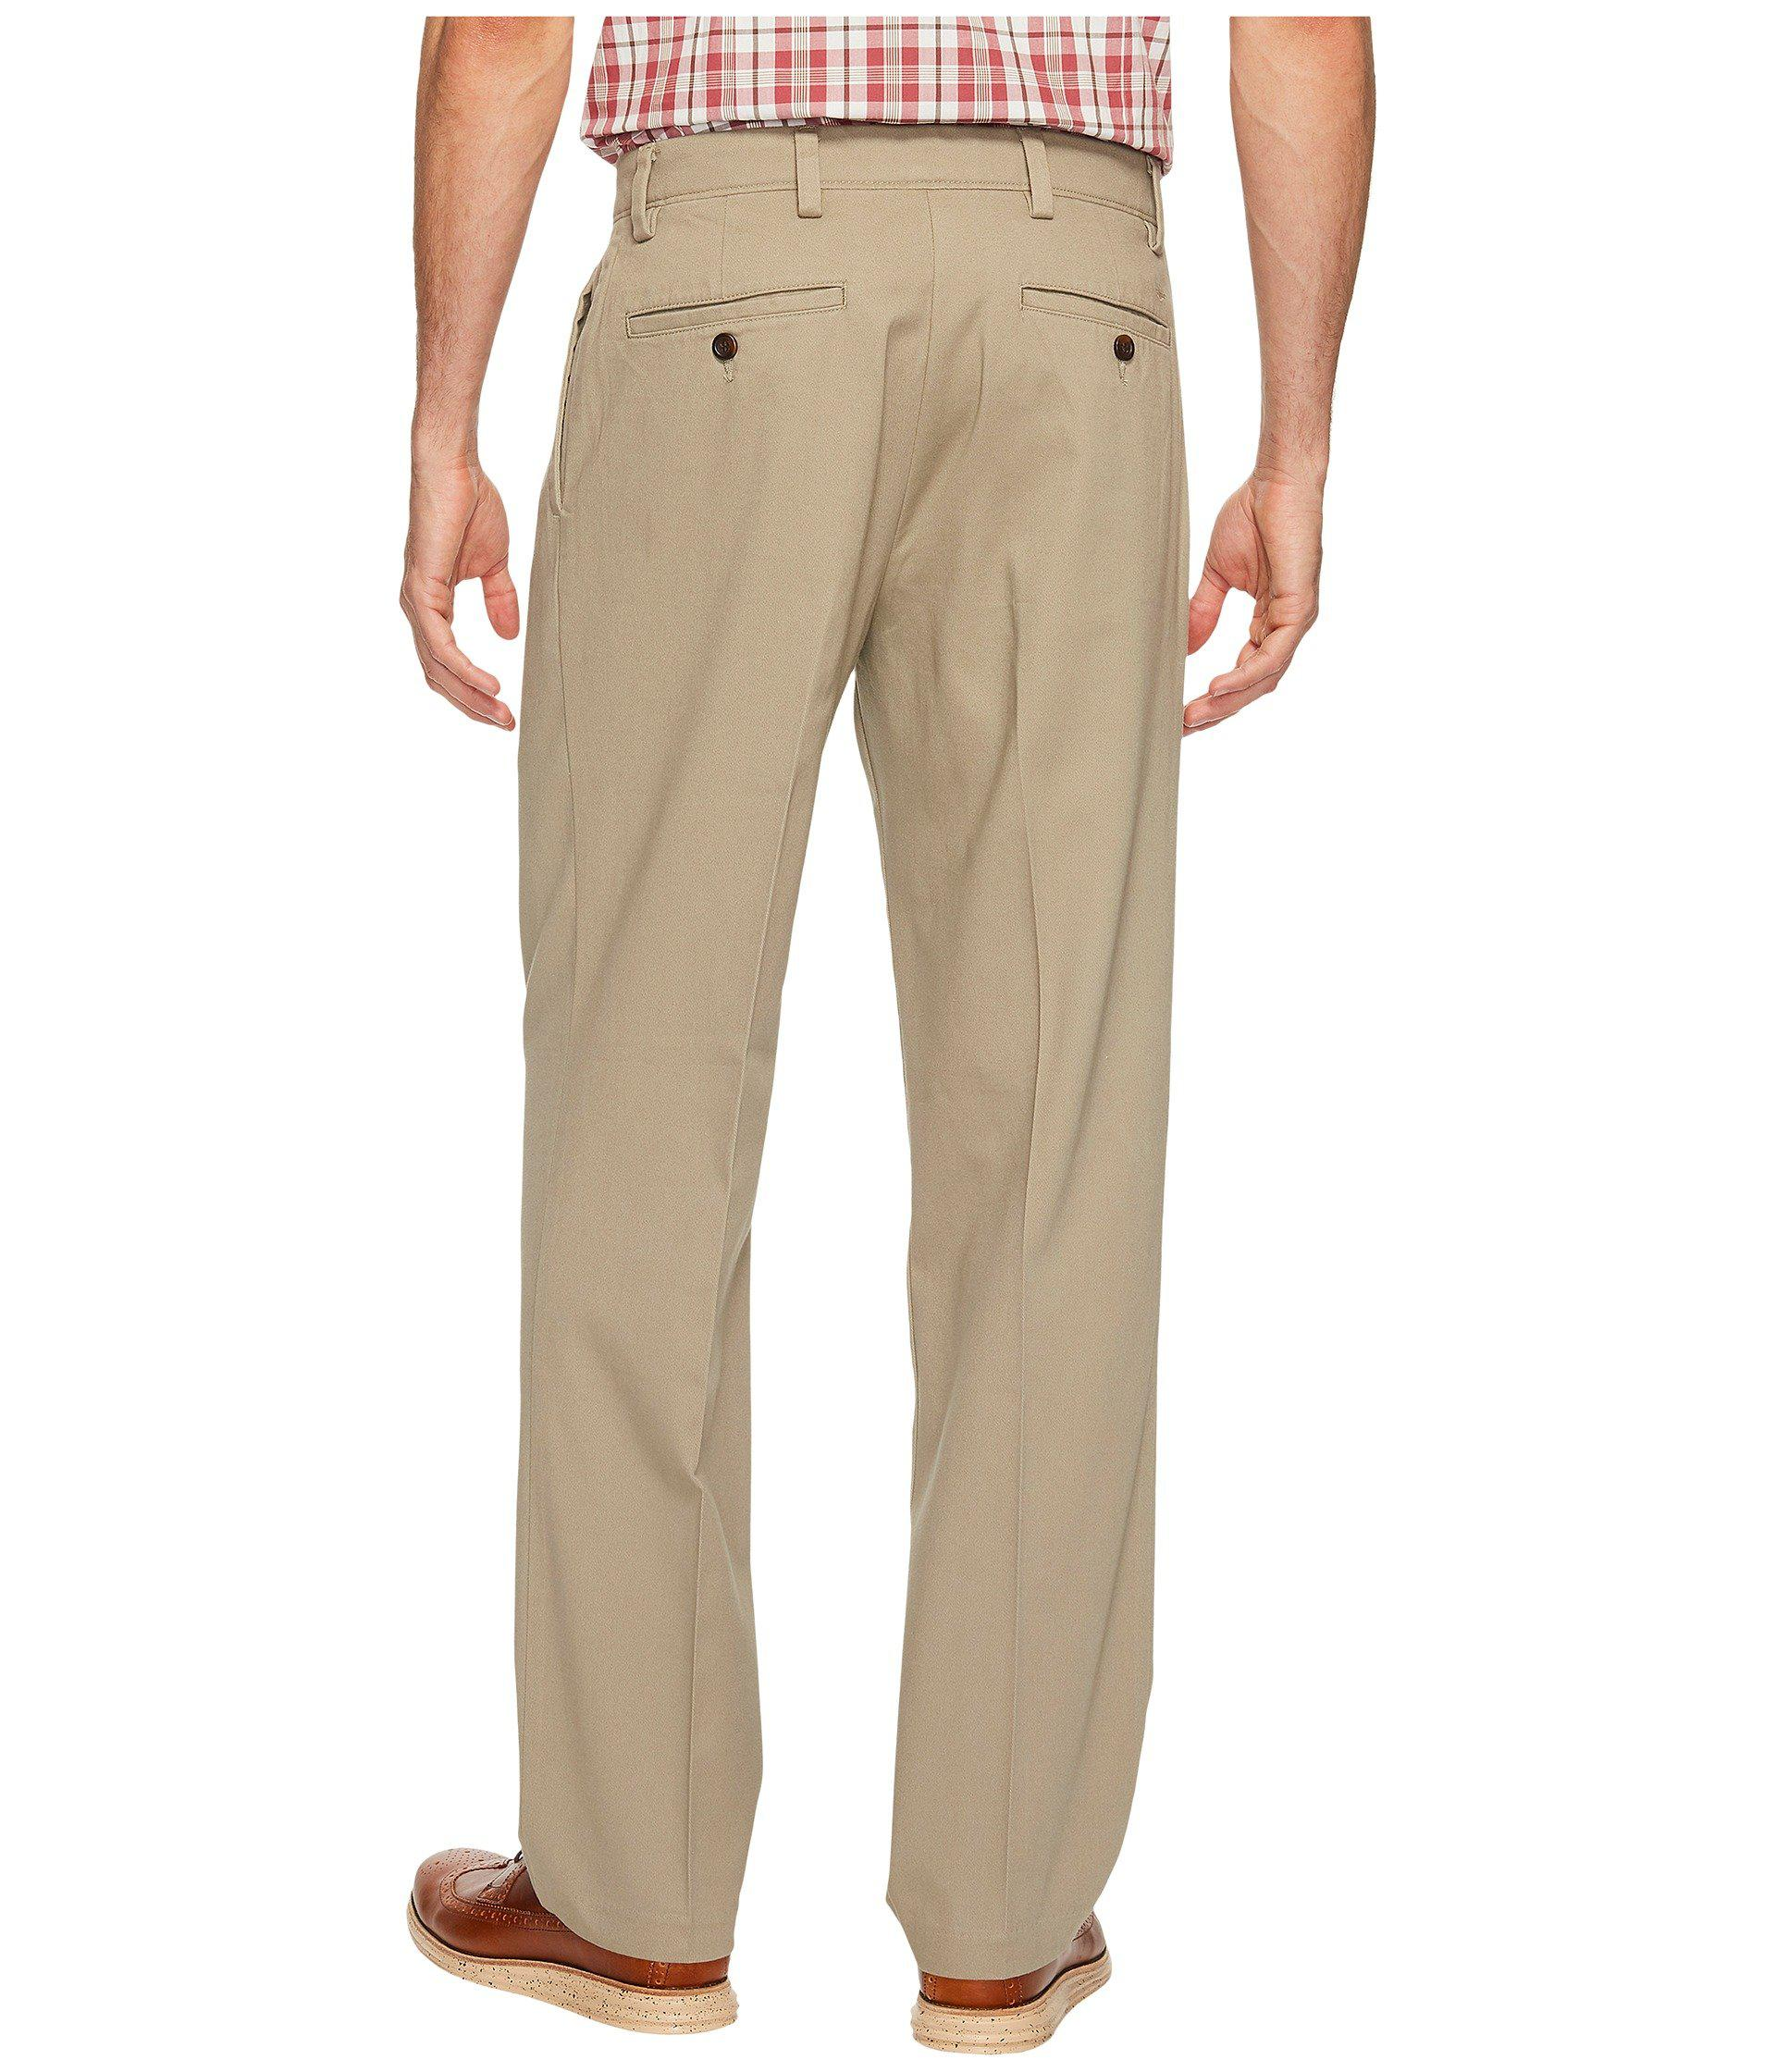 DOCKERS EASY KHAKI BIG /& TALL CLASSIC FIT PANTS